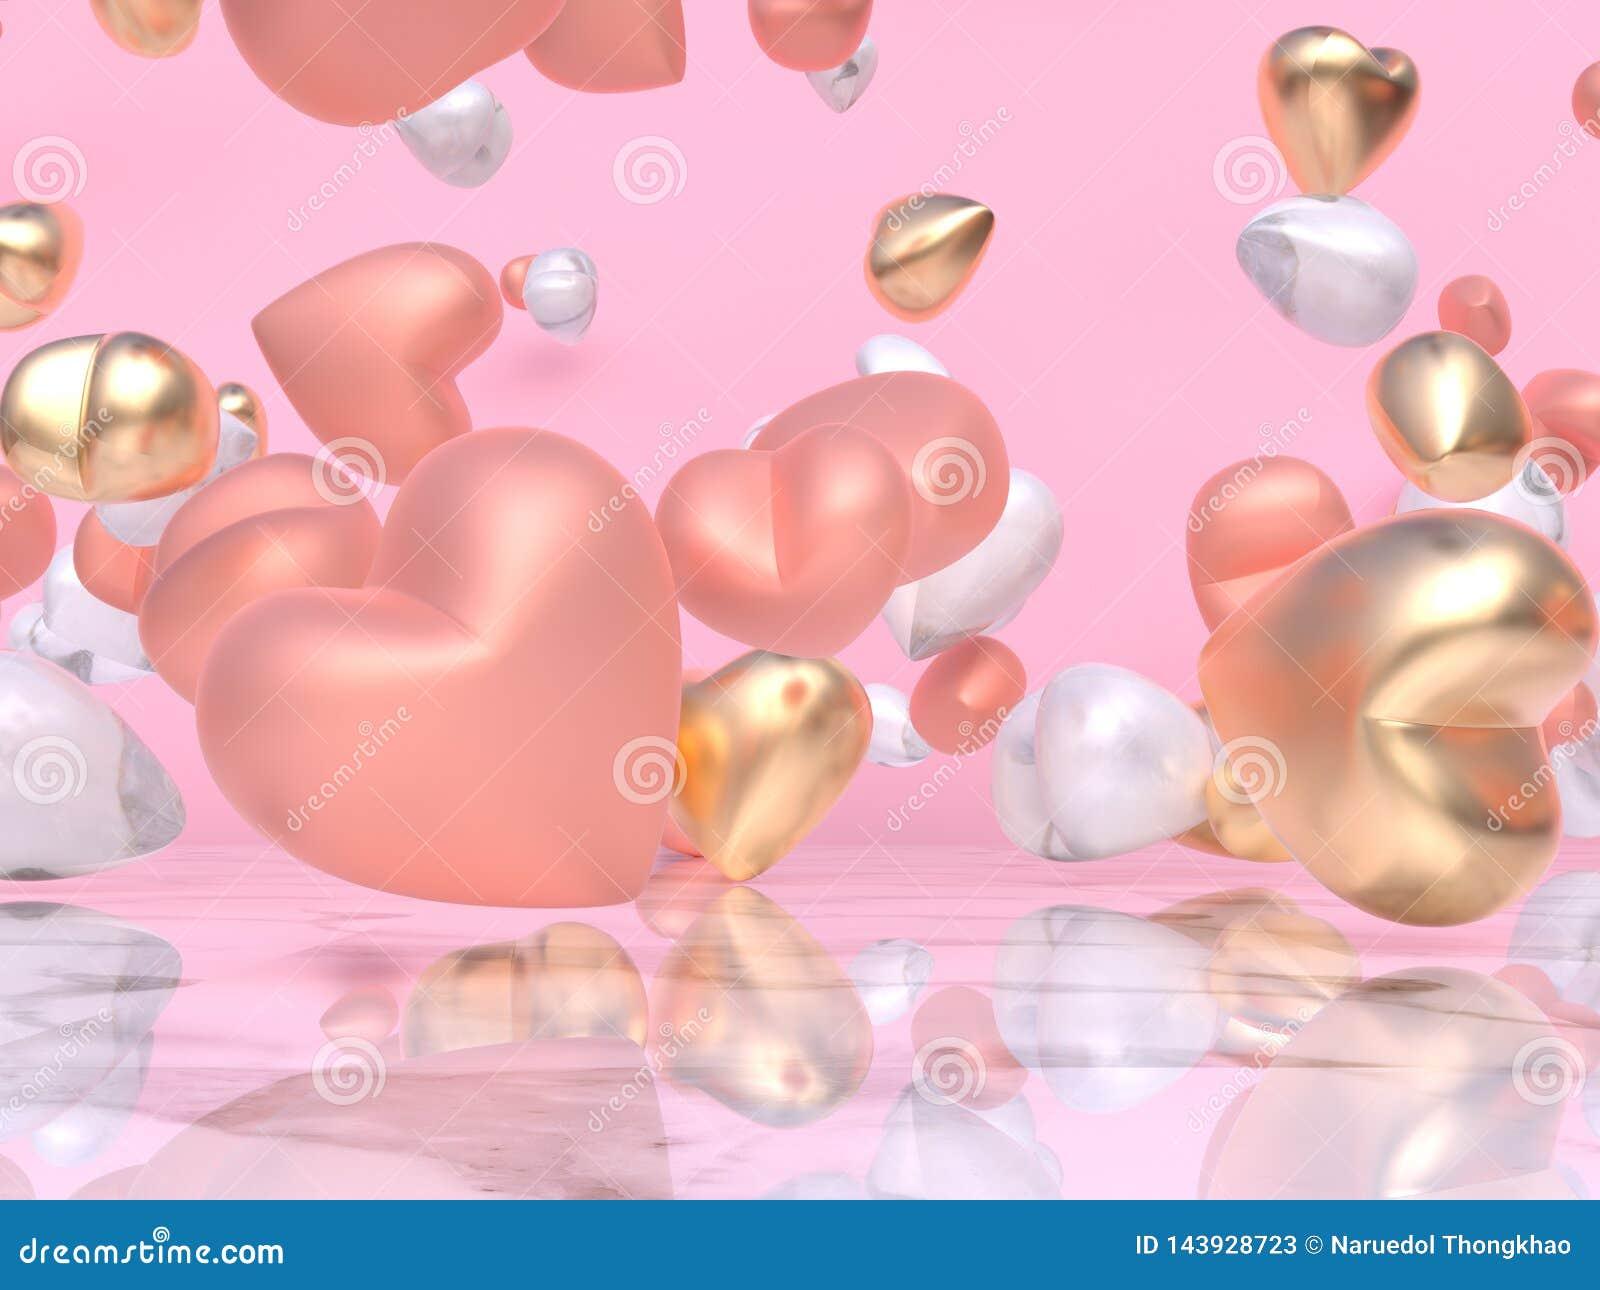 Różowy złocisty serca 3d rendering